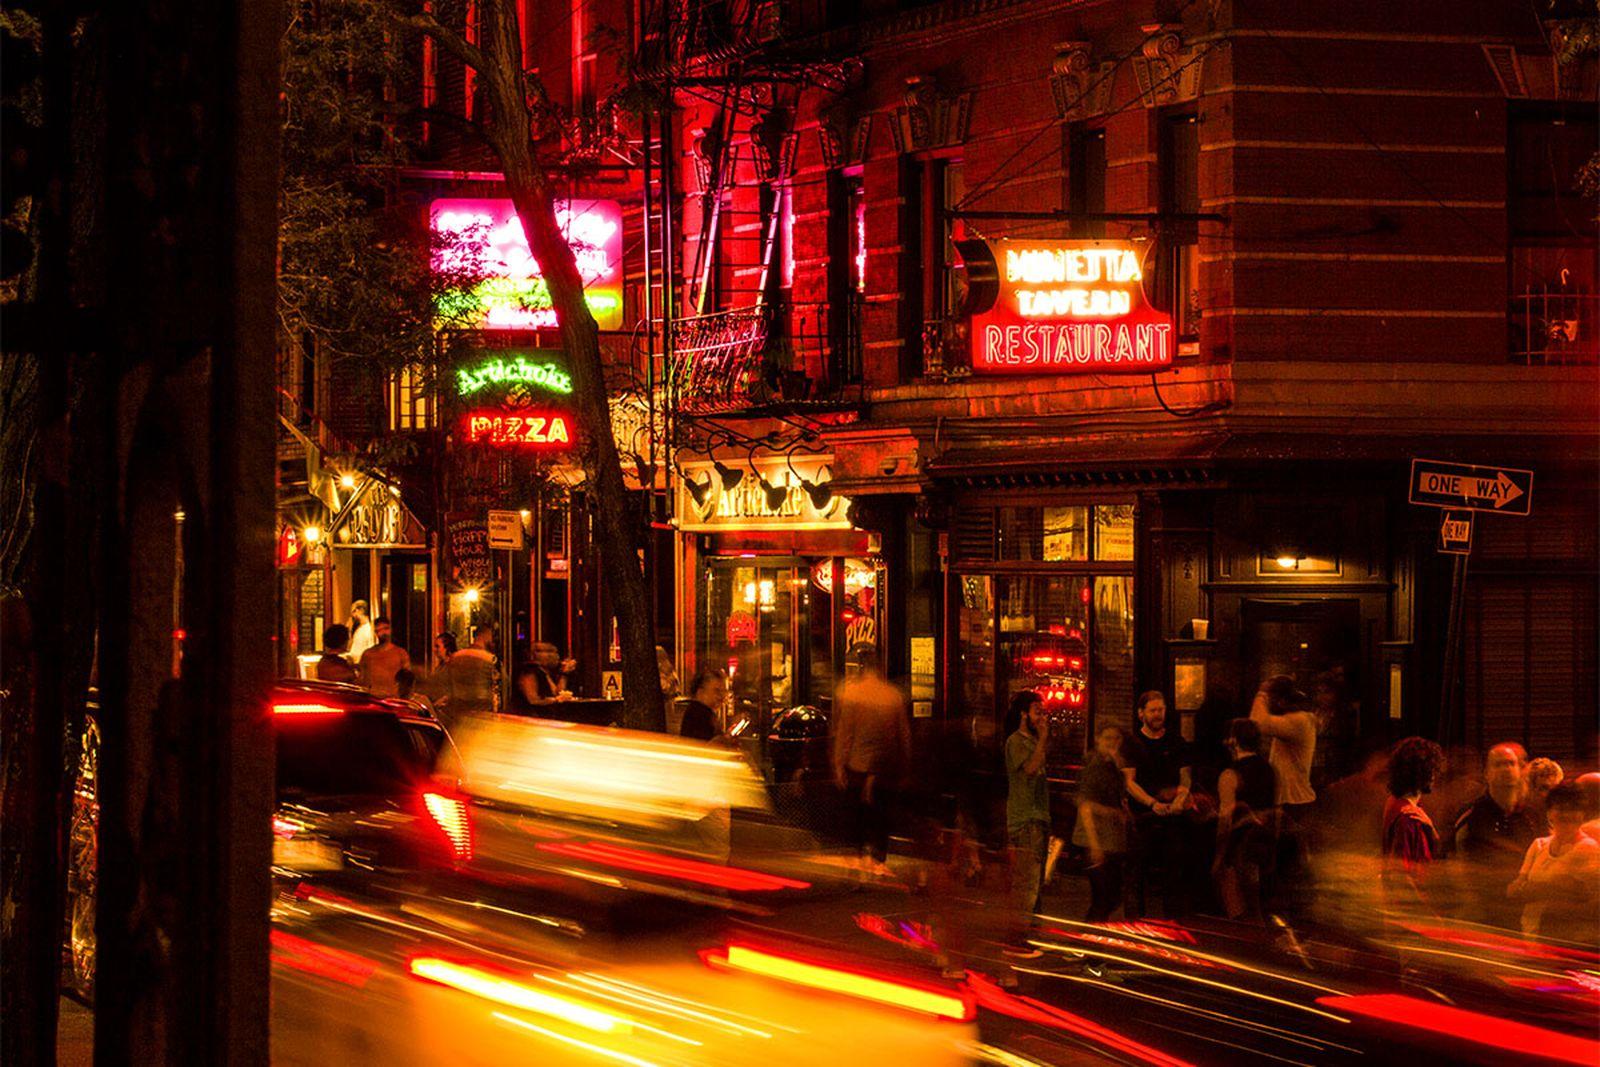 best bars new york minetta tavern AMEX american express platinum food & drink